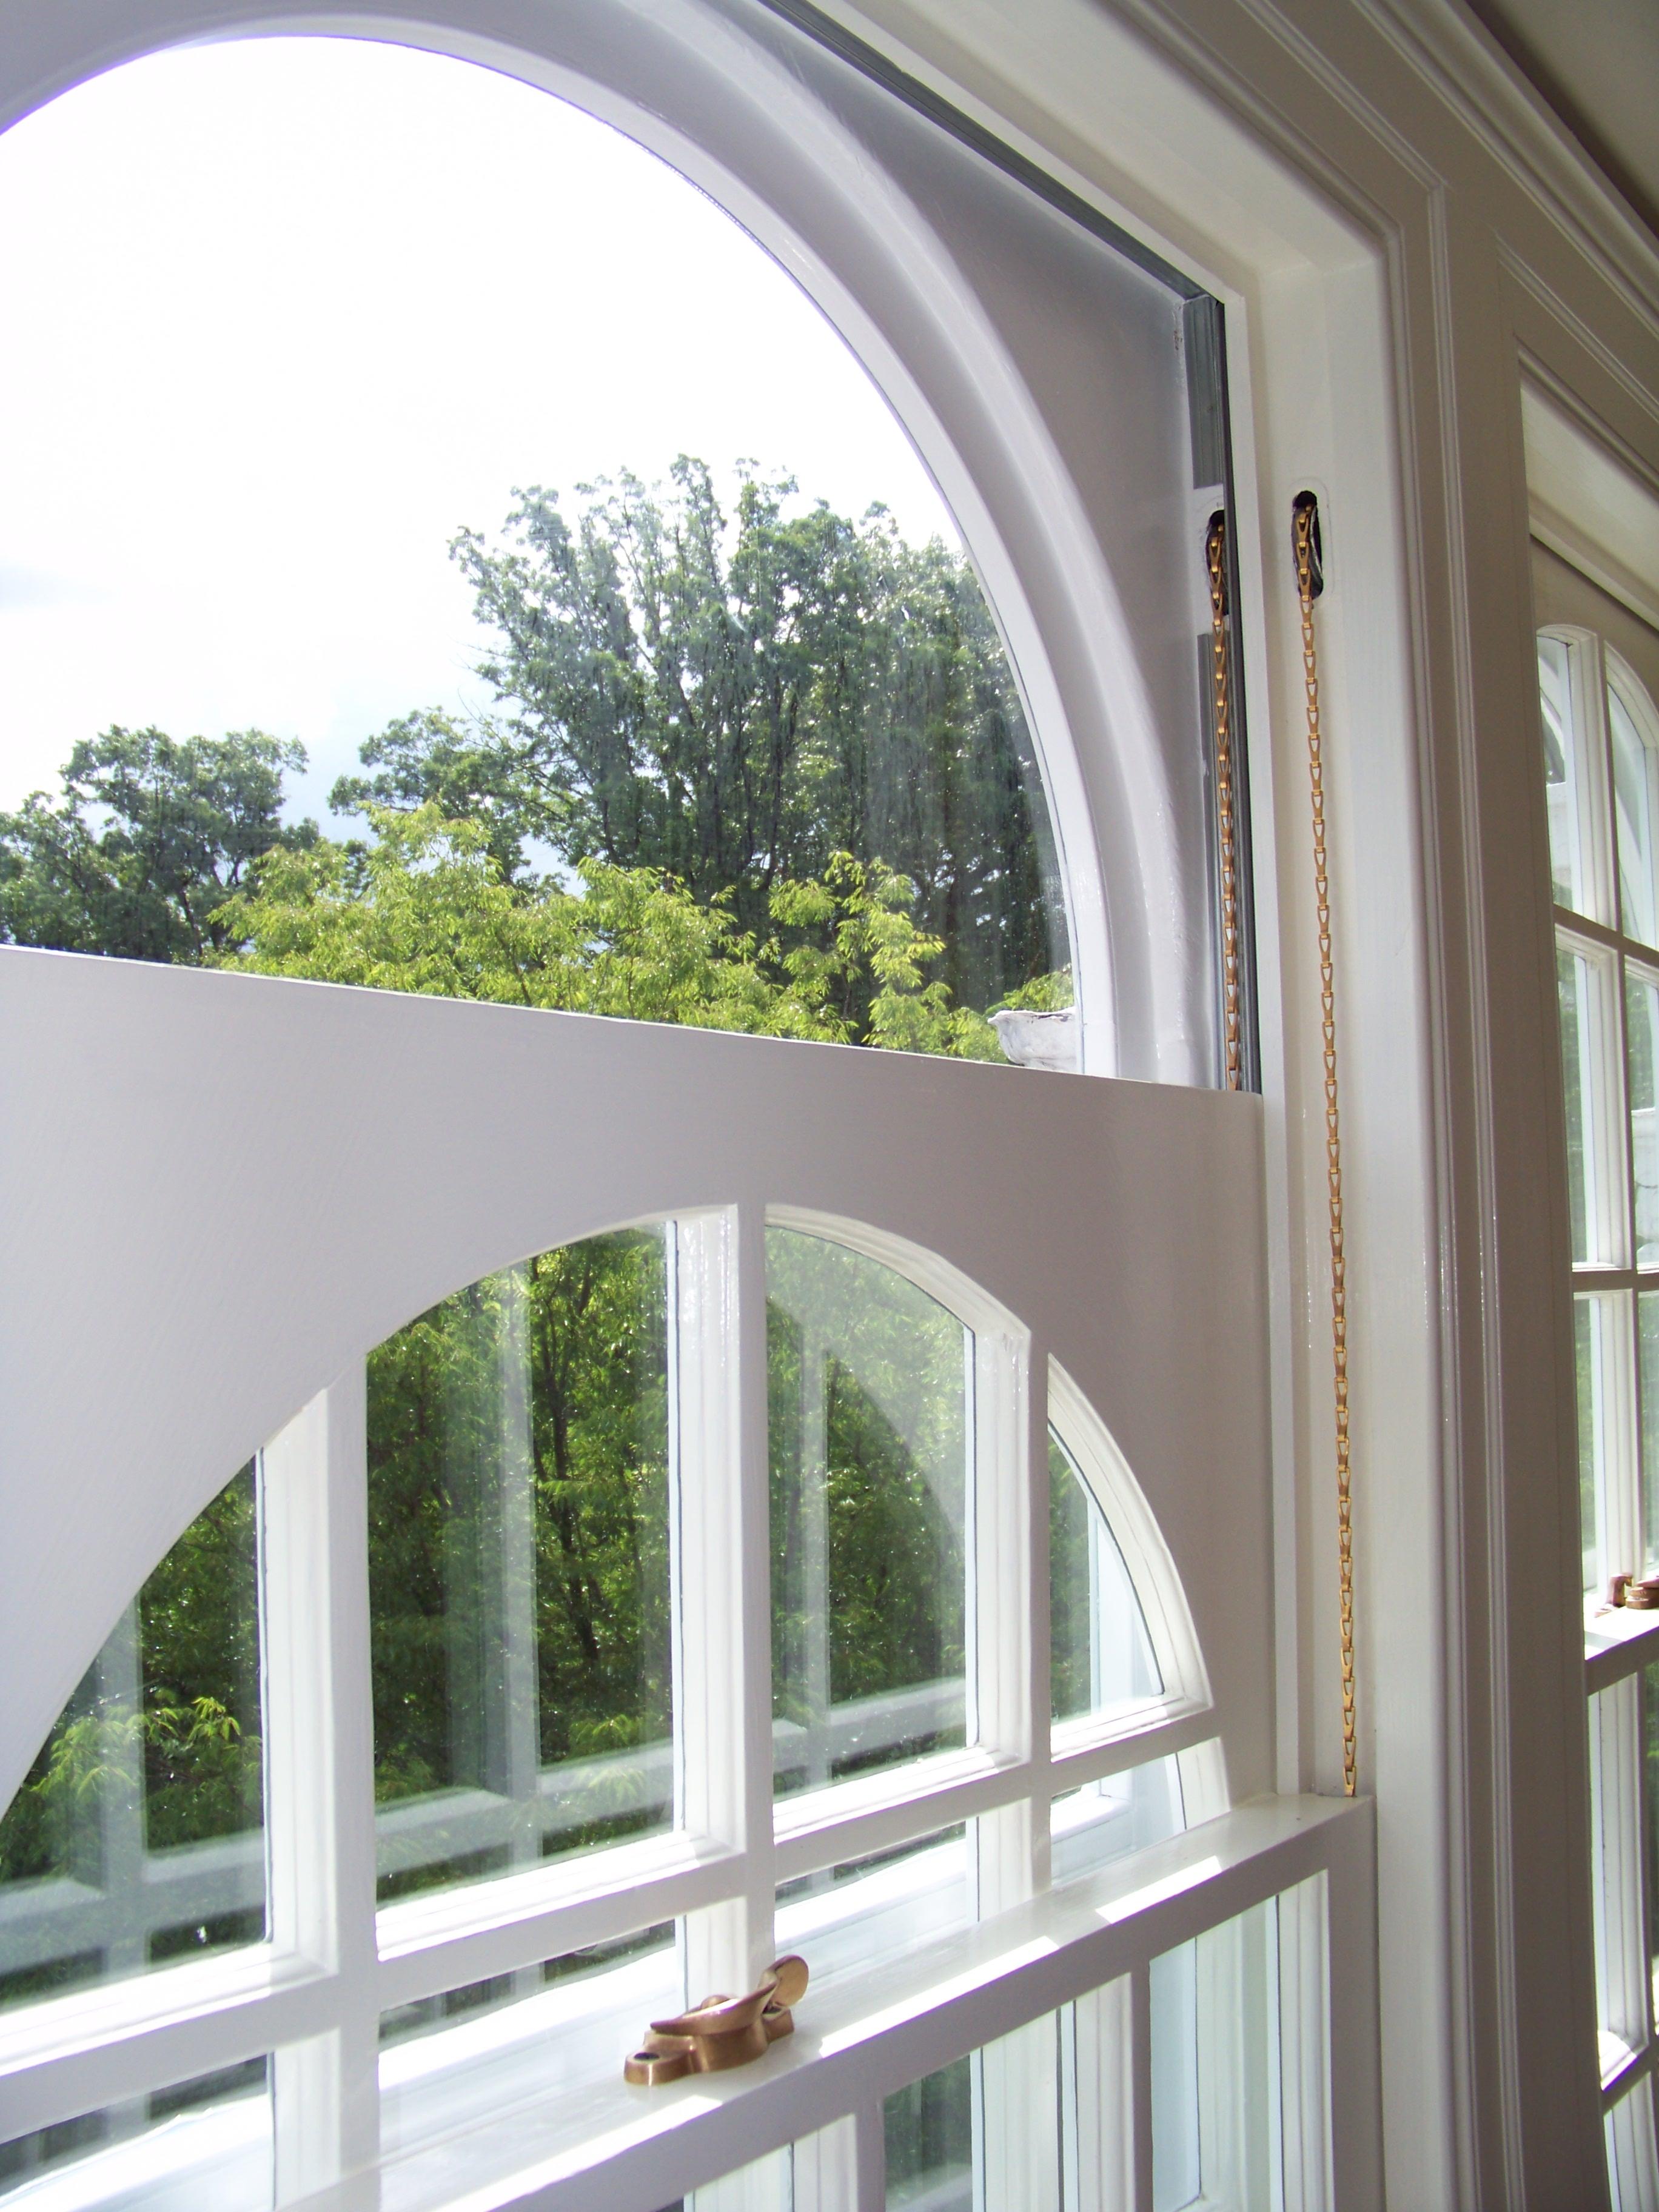 Residential Windows And Doors U2013 Adams Morgan, DC